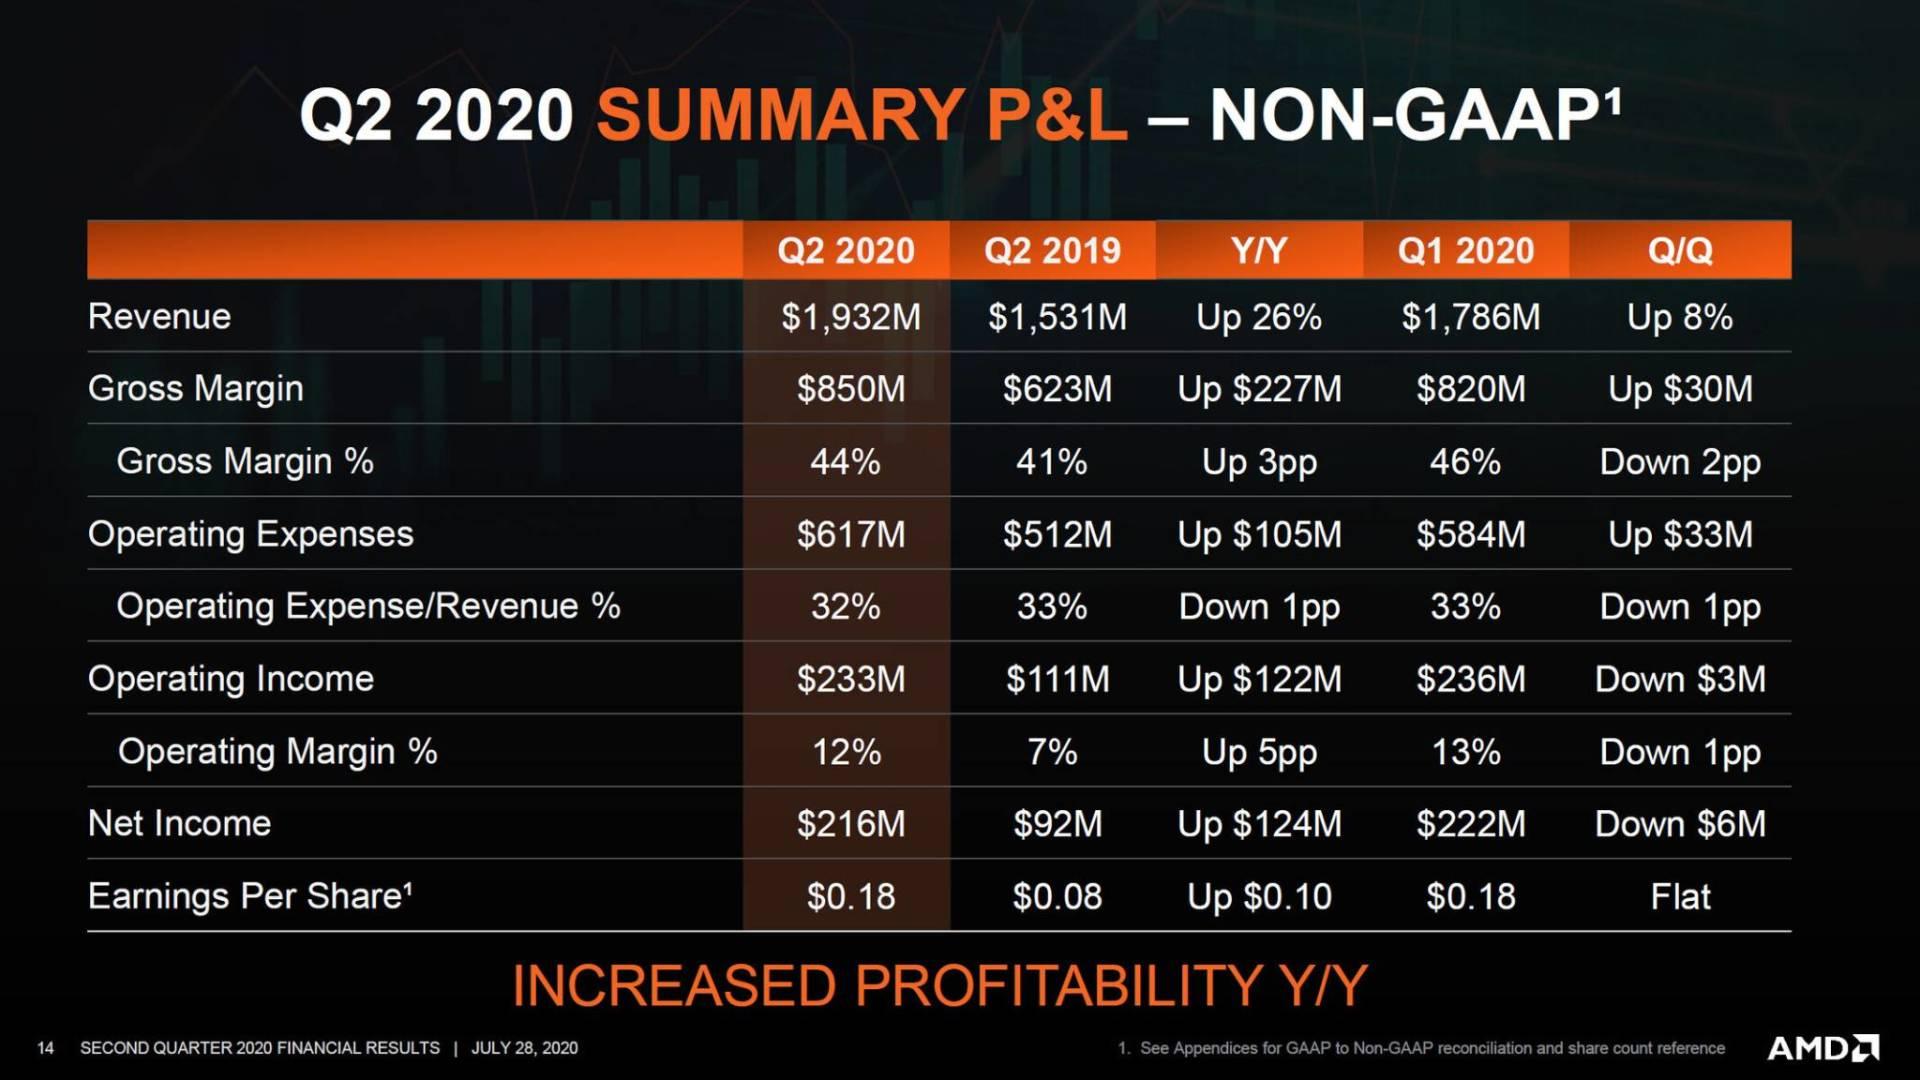 AMD Q2 2020